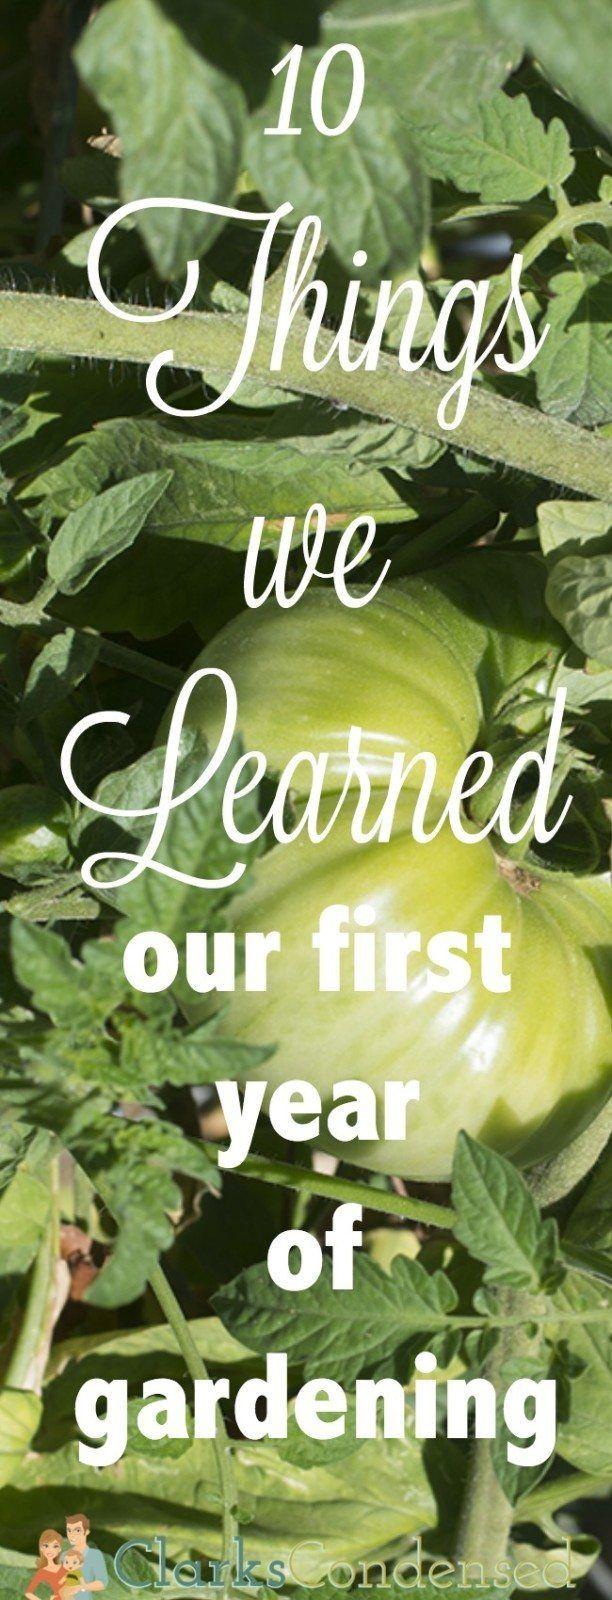 best 25 gardening for beginners ideas on pinterest vegetable planting guide gardening tips and organic gardening tips